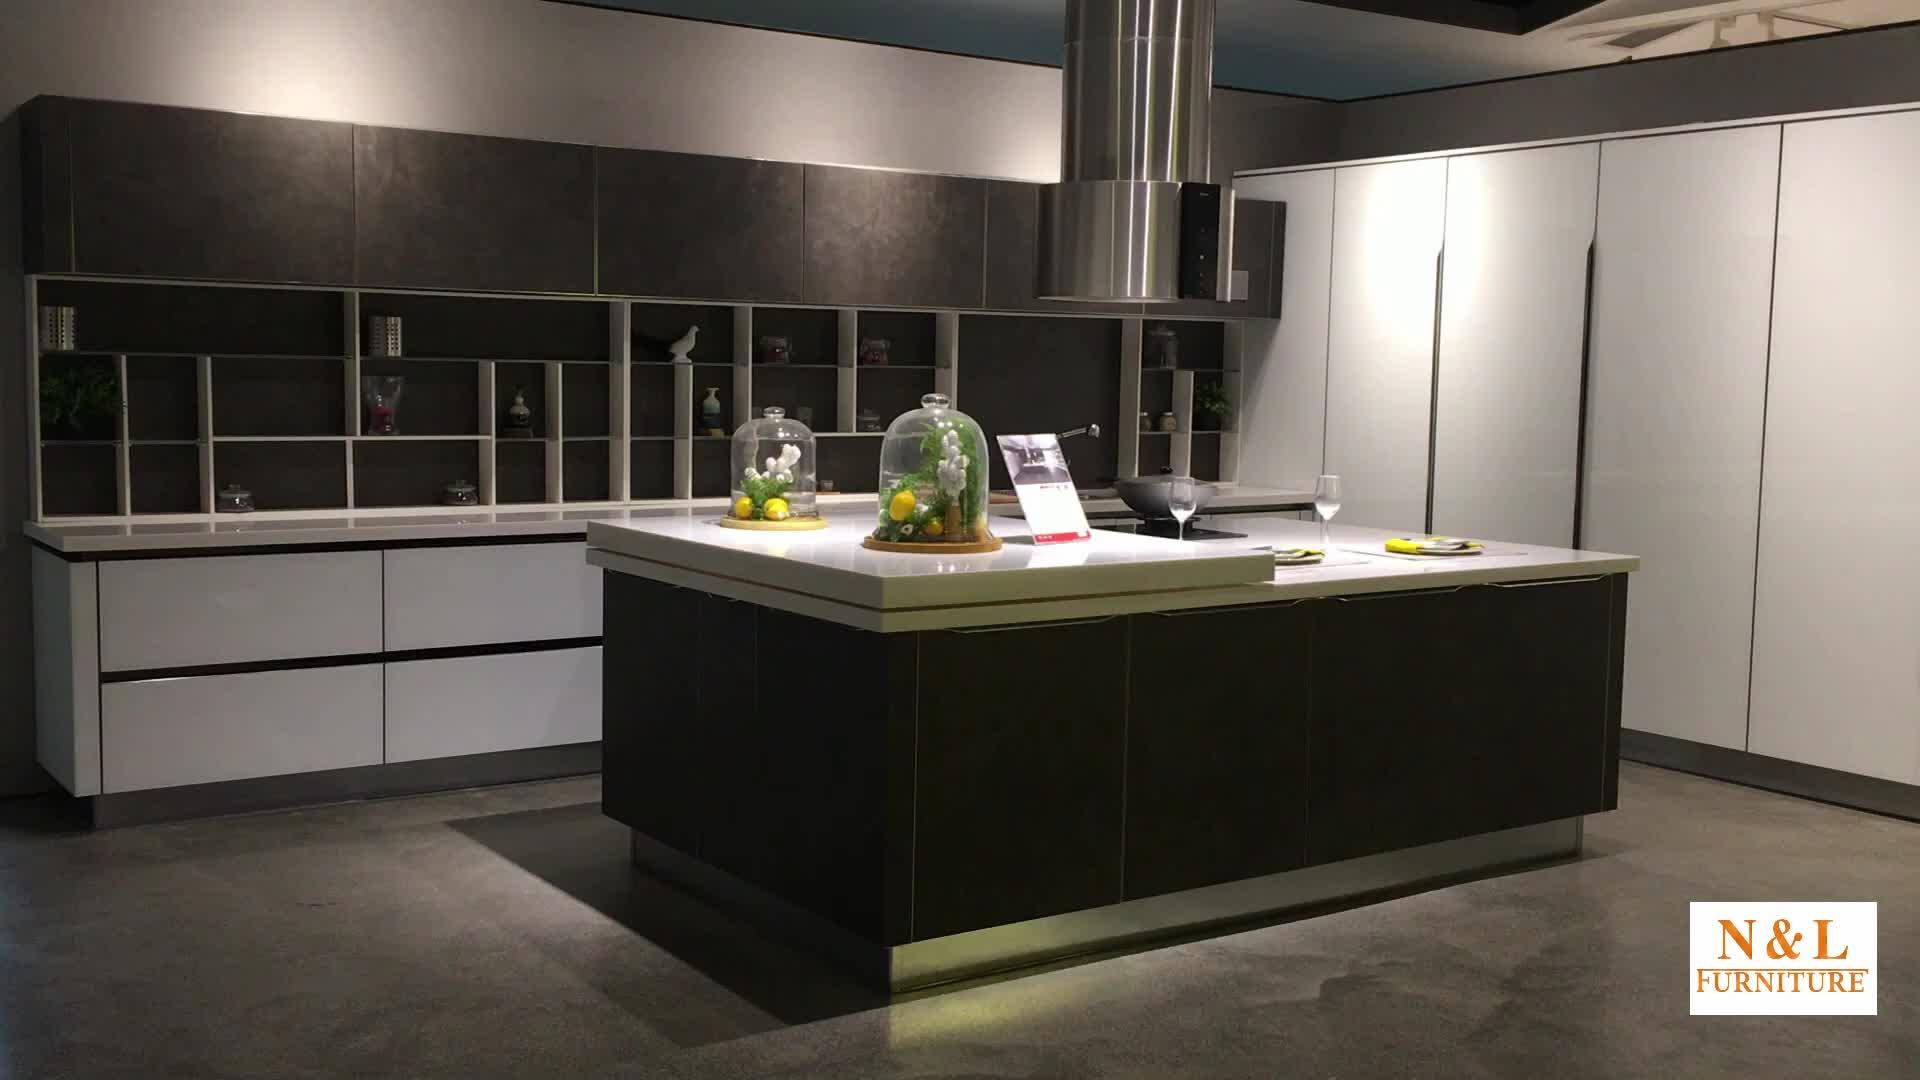 Contemporary Kitchen Lacquered High Gloss Airone Torchetti: High Gloss Lacquer Kitchen Cabinet,Kitchen Cabinet Designs